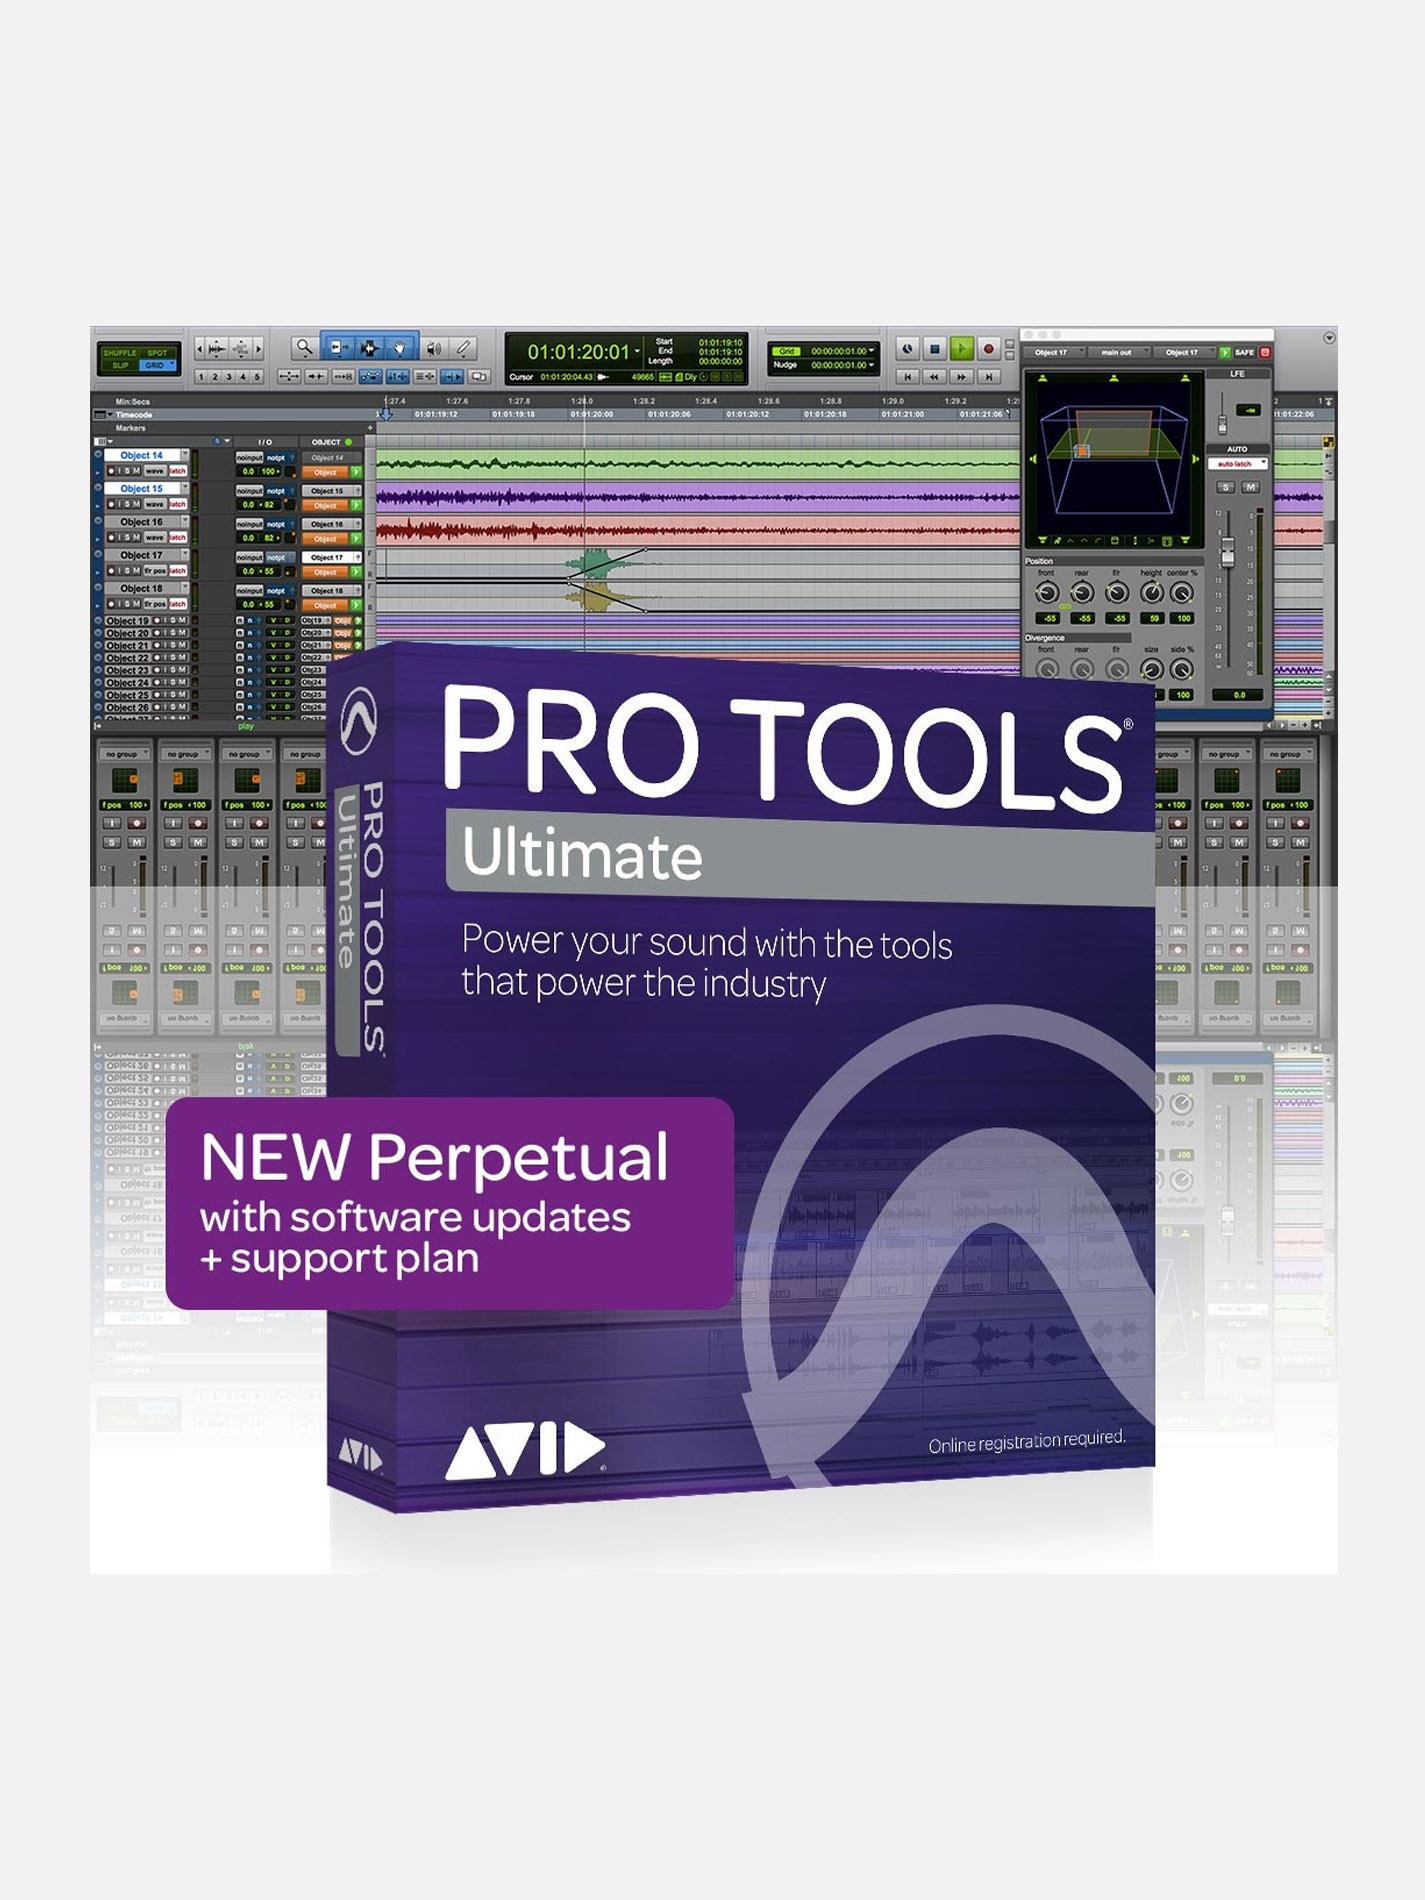 AVID – PRO TOOLS | ULTIMATE Perpetual License NEW (Software HD, no iLok)